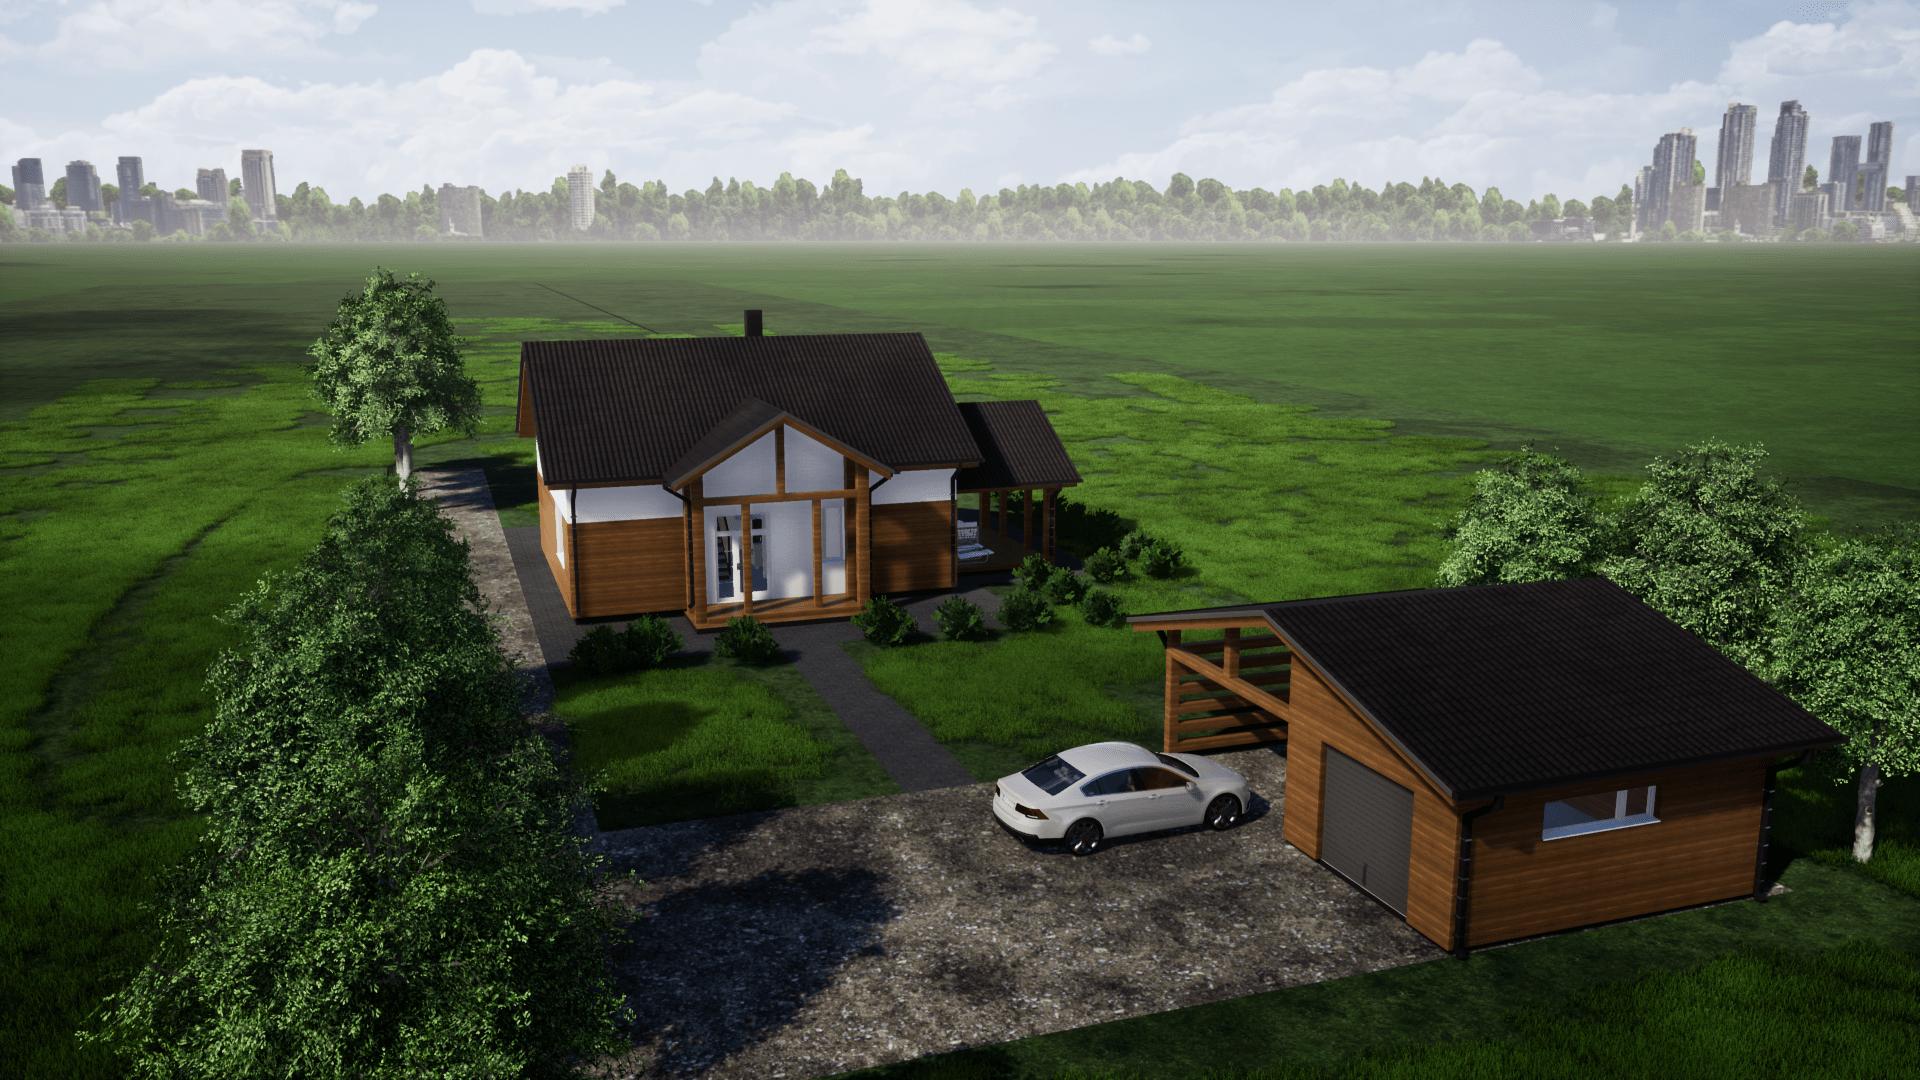 Namo projektas su garažu atskirai